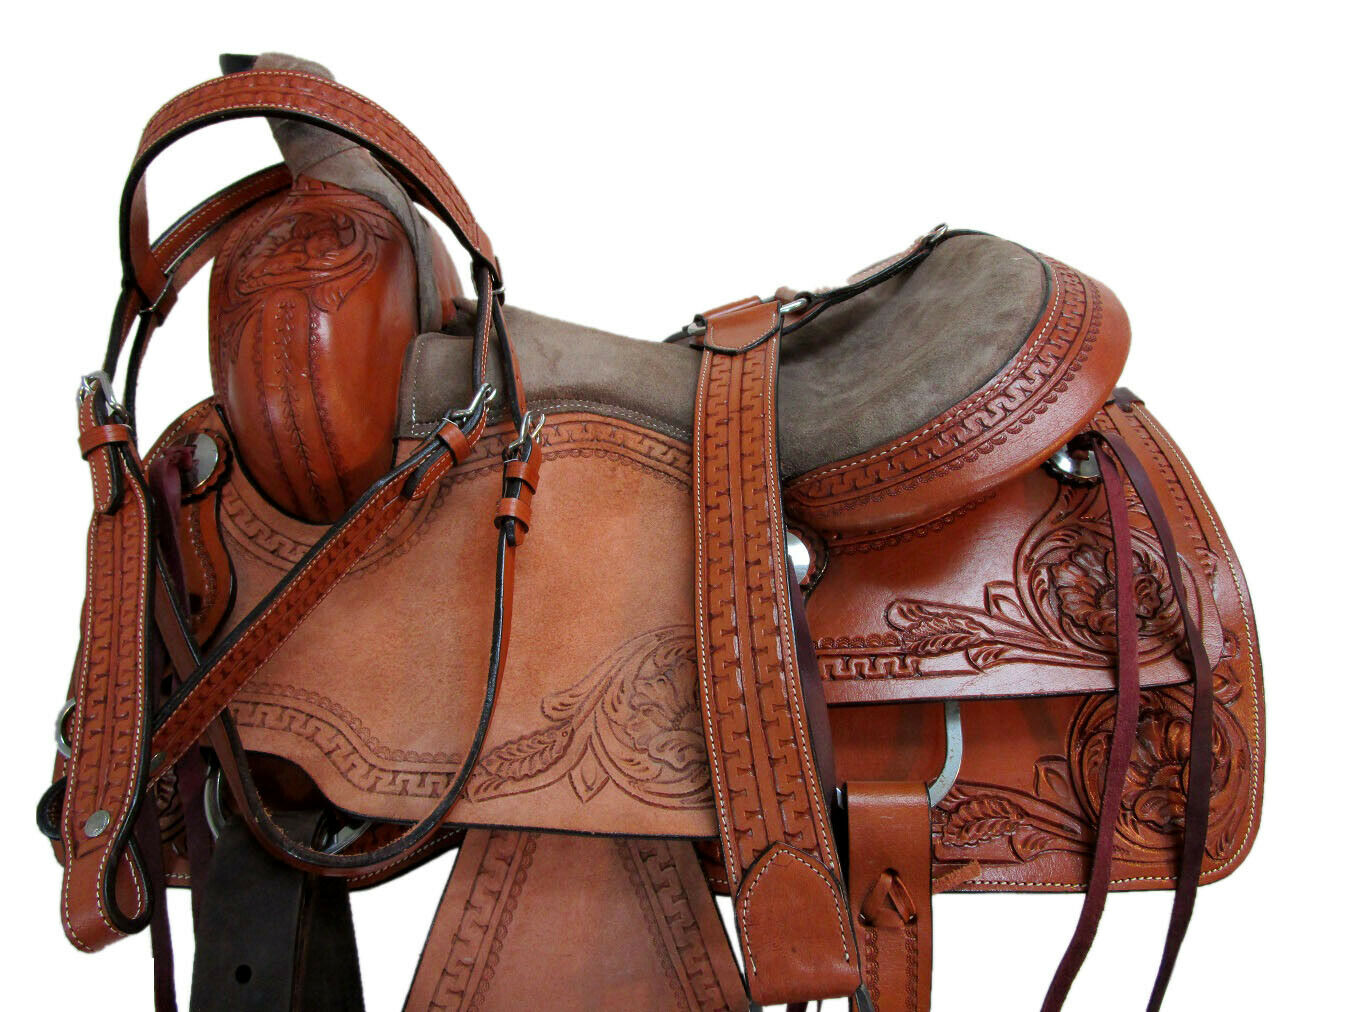 WESTERN TRAIL SADDLE HORSE FLORAL TOOLED SNAKE BORDER PLEASURE PACKAGE 15 16 SET